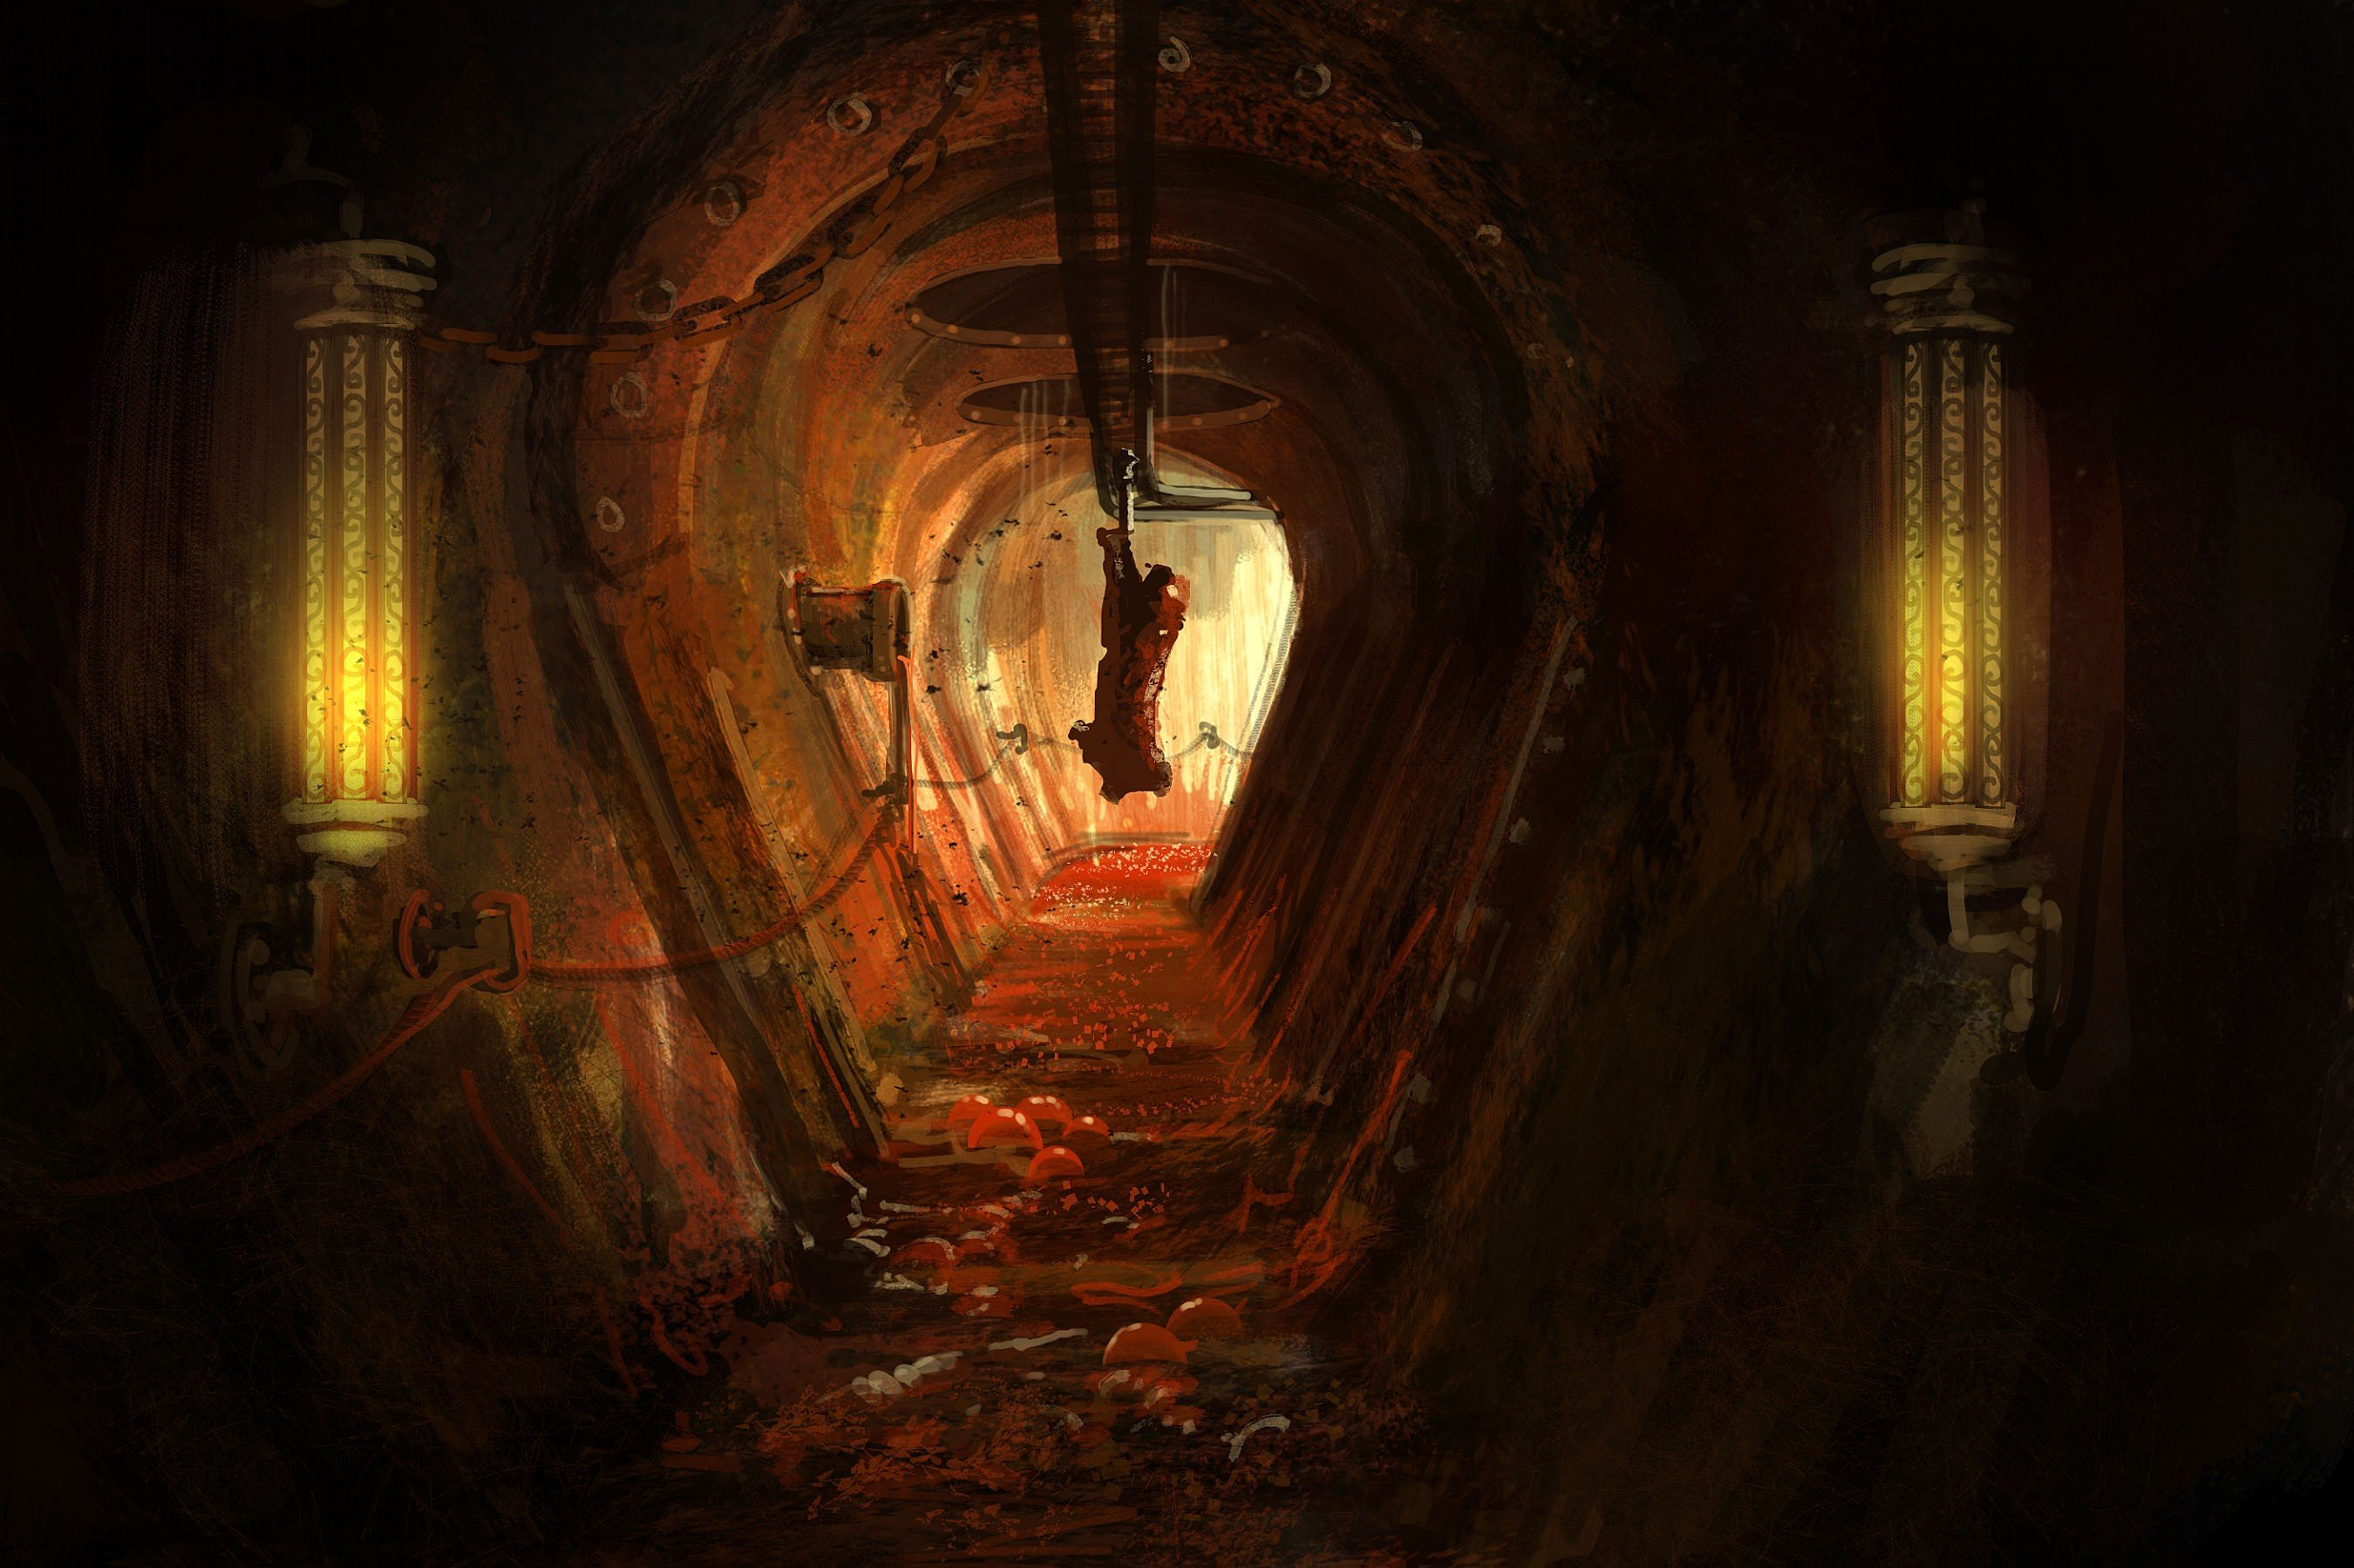 creepy, Digital art, Artwork, Horror, Meat, Pigs, Lights, Blood, Amnesia: A Machine for Pigs, Video games, Chains Wallpaper